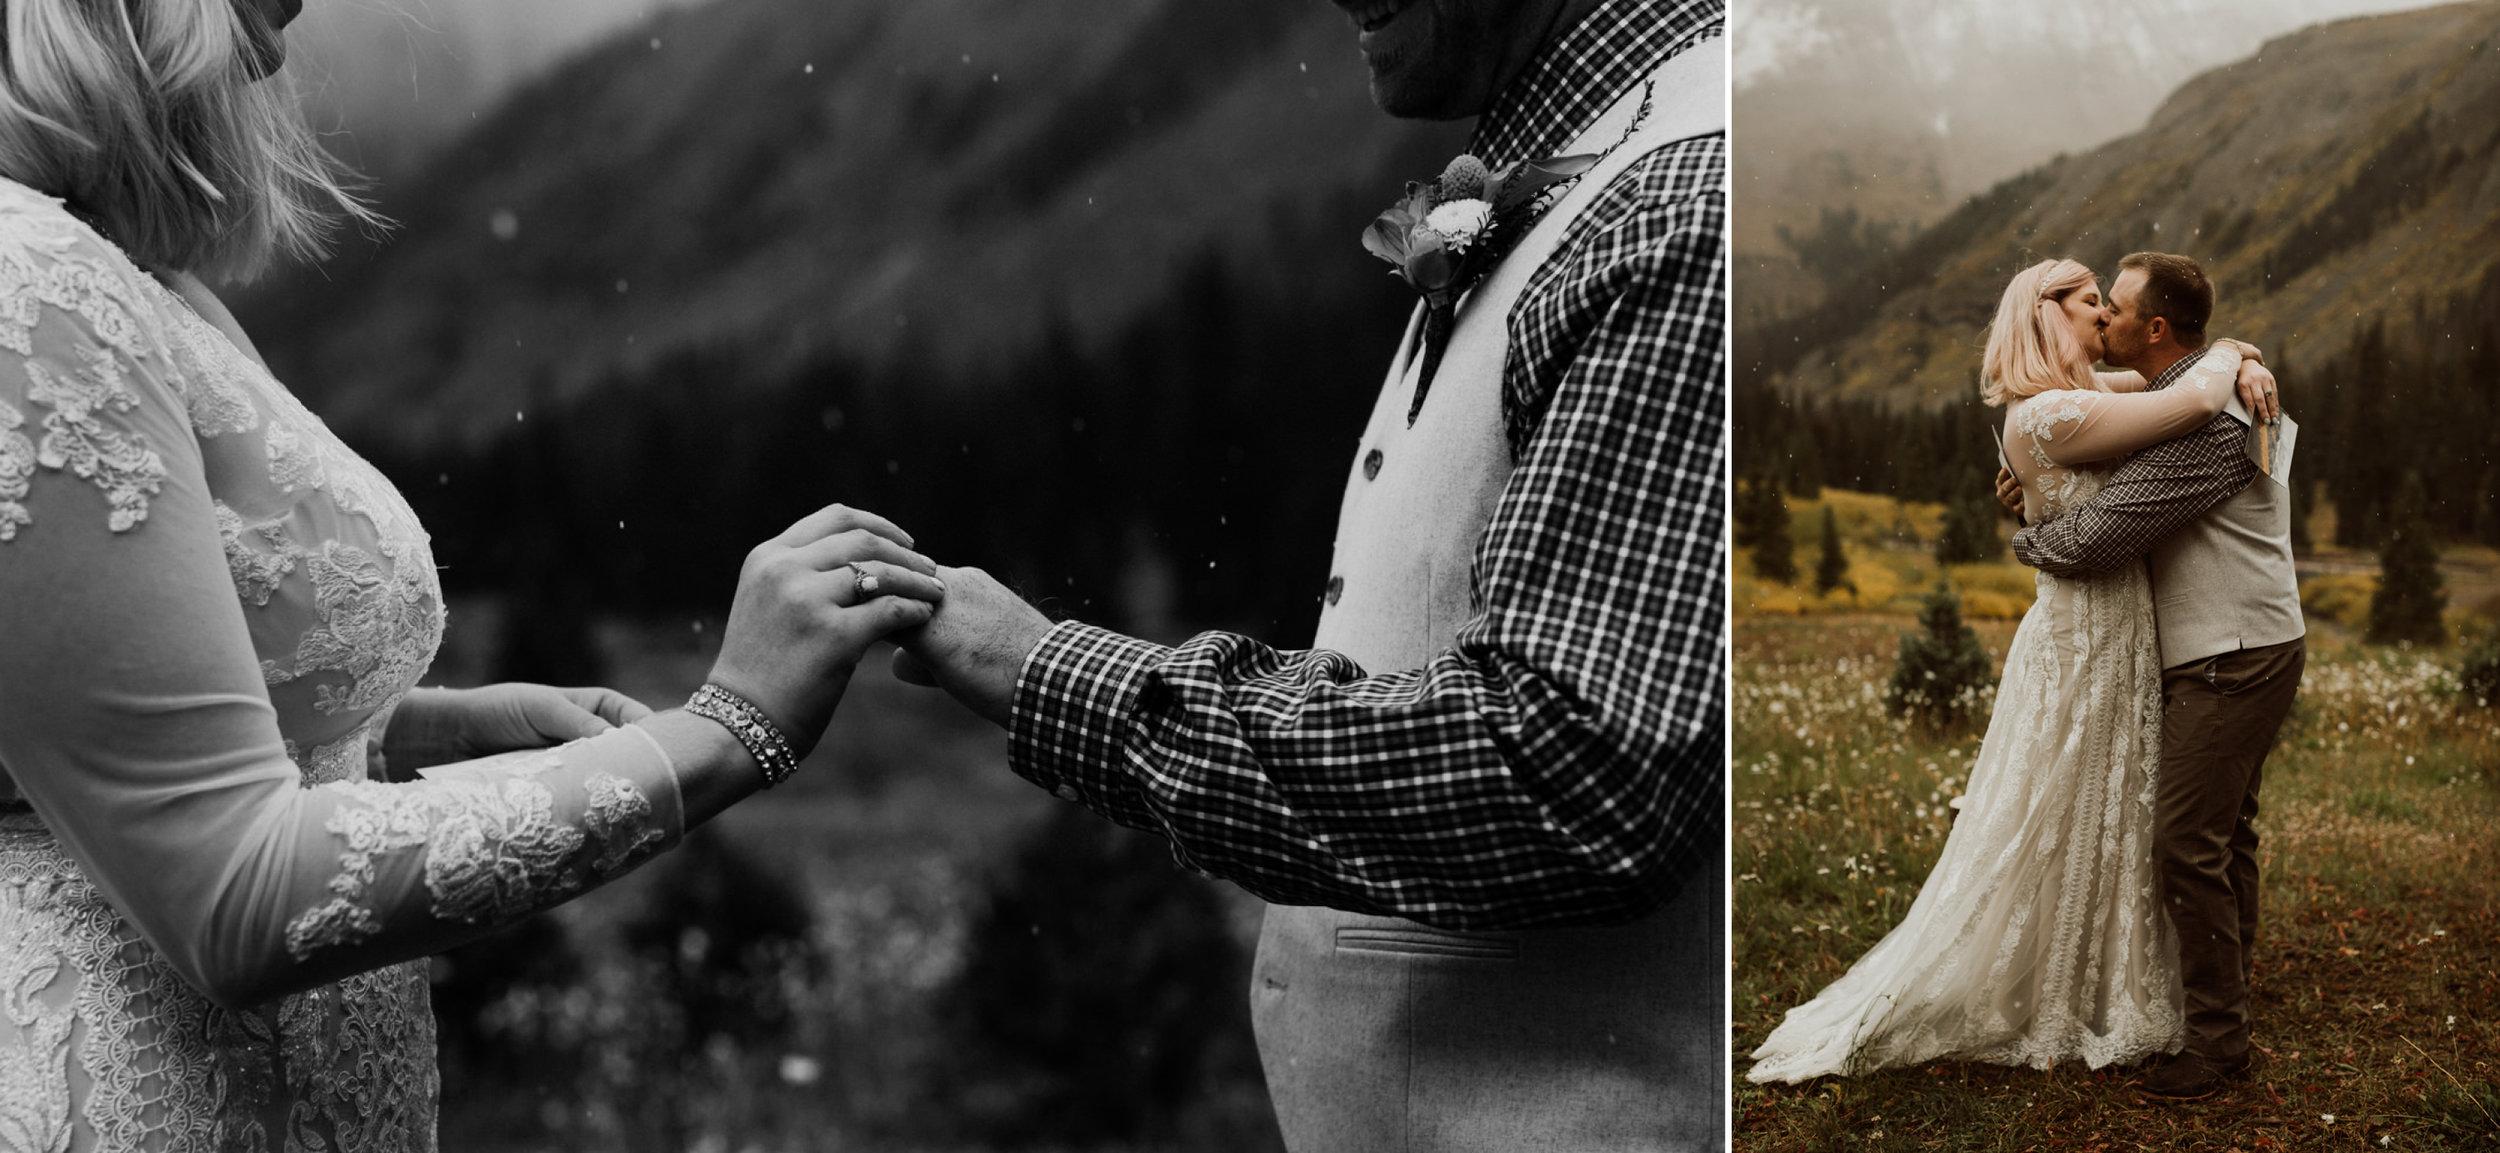 17-9-adventure-wedding-photographer-33.jpg